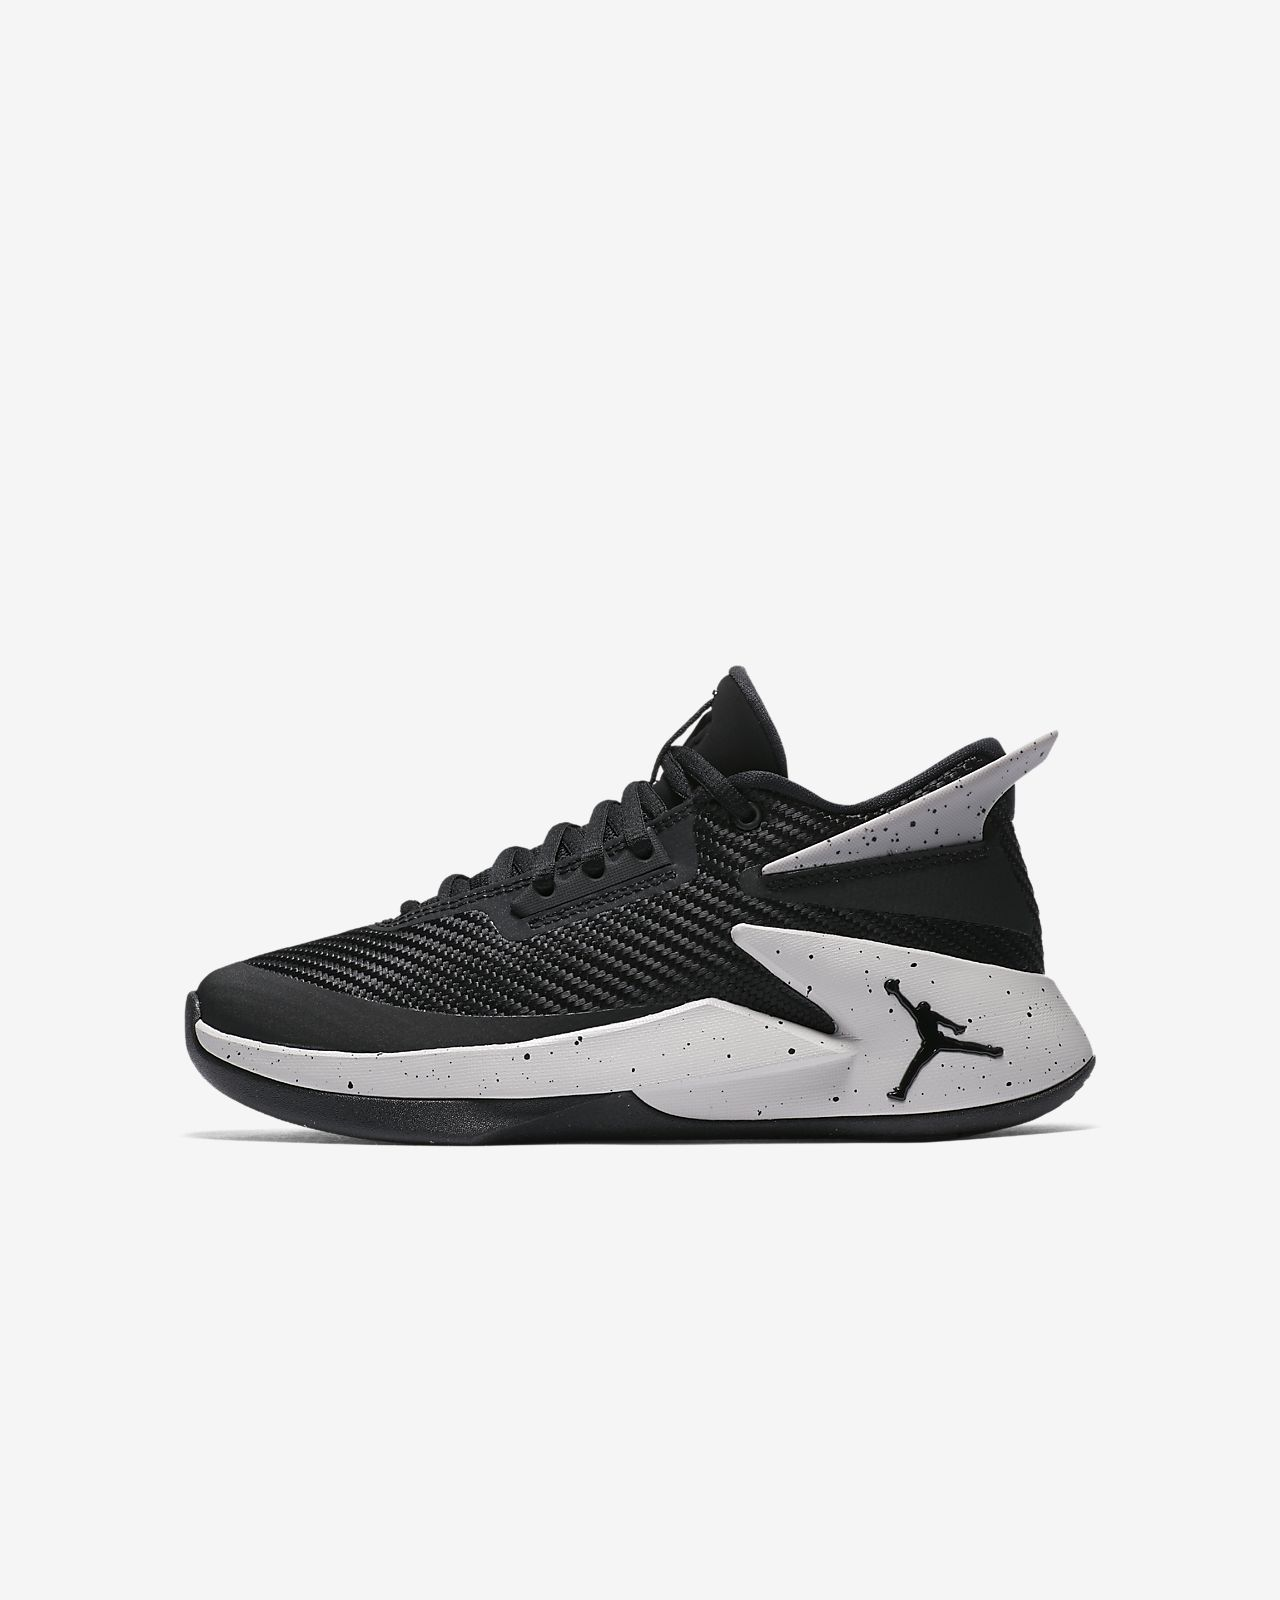 Jordan FLY LOCKDOWN - Basketball shoes - gym red/black/white i0jSytr